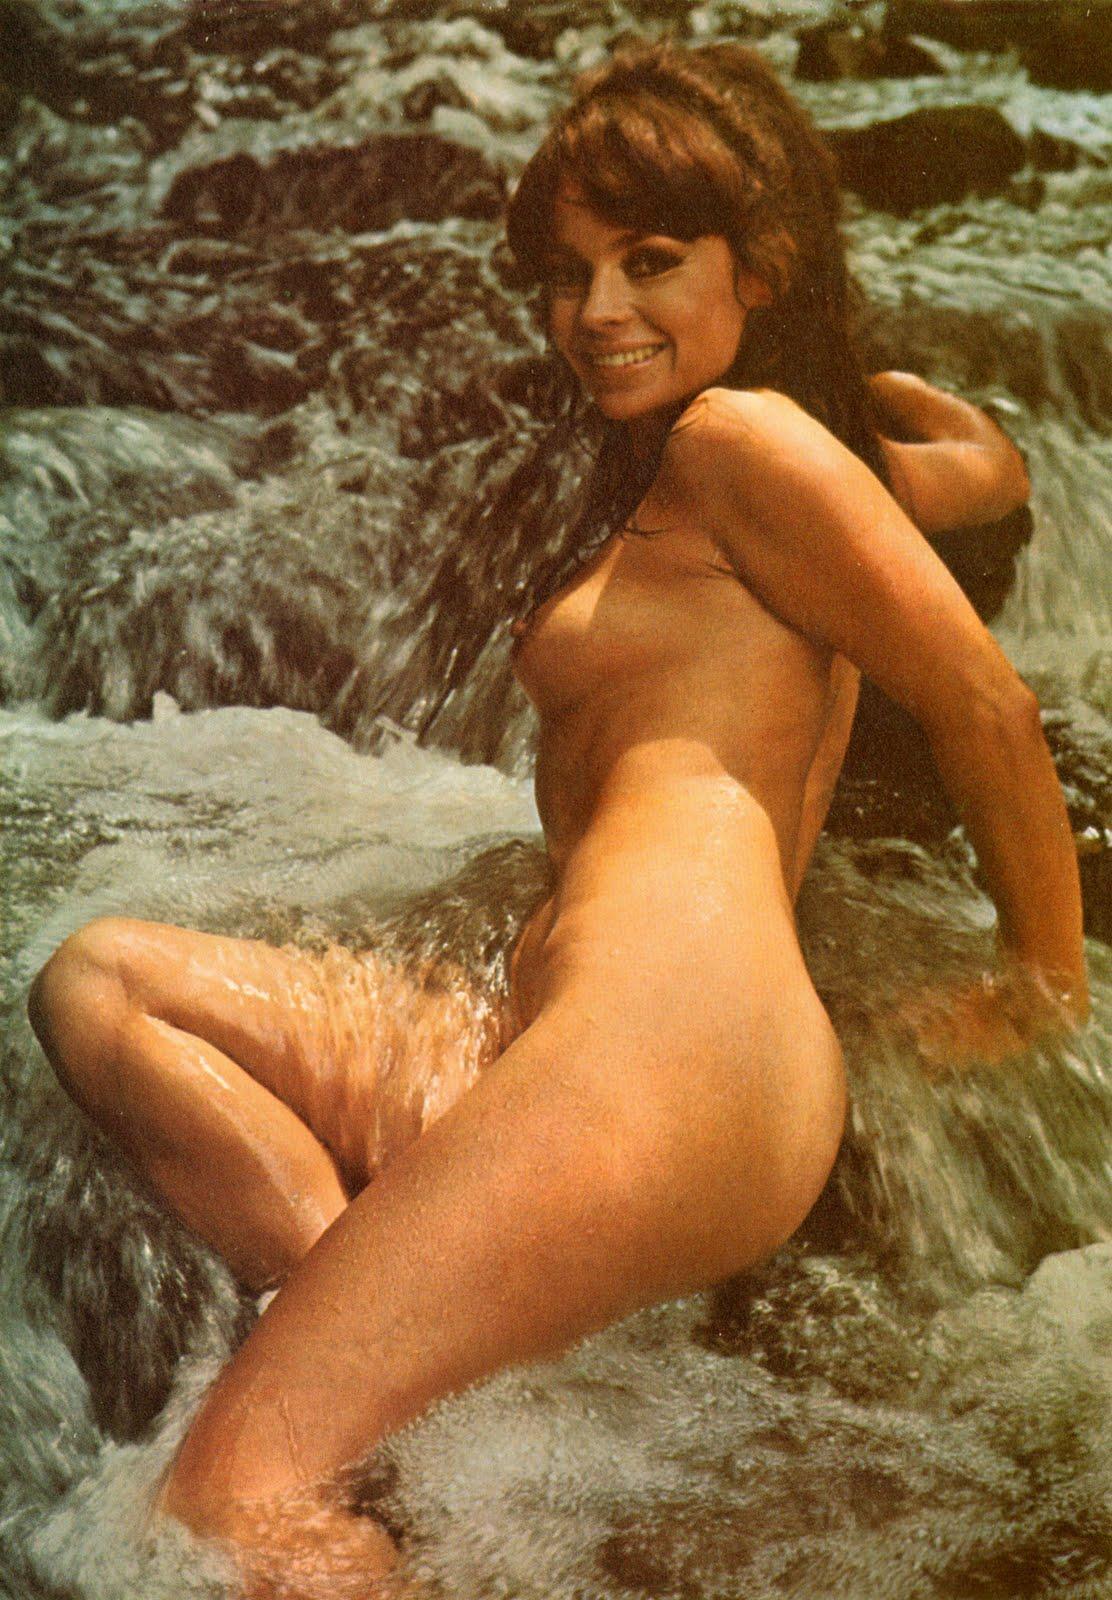 liz cavalier hot nude pic